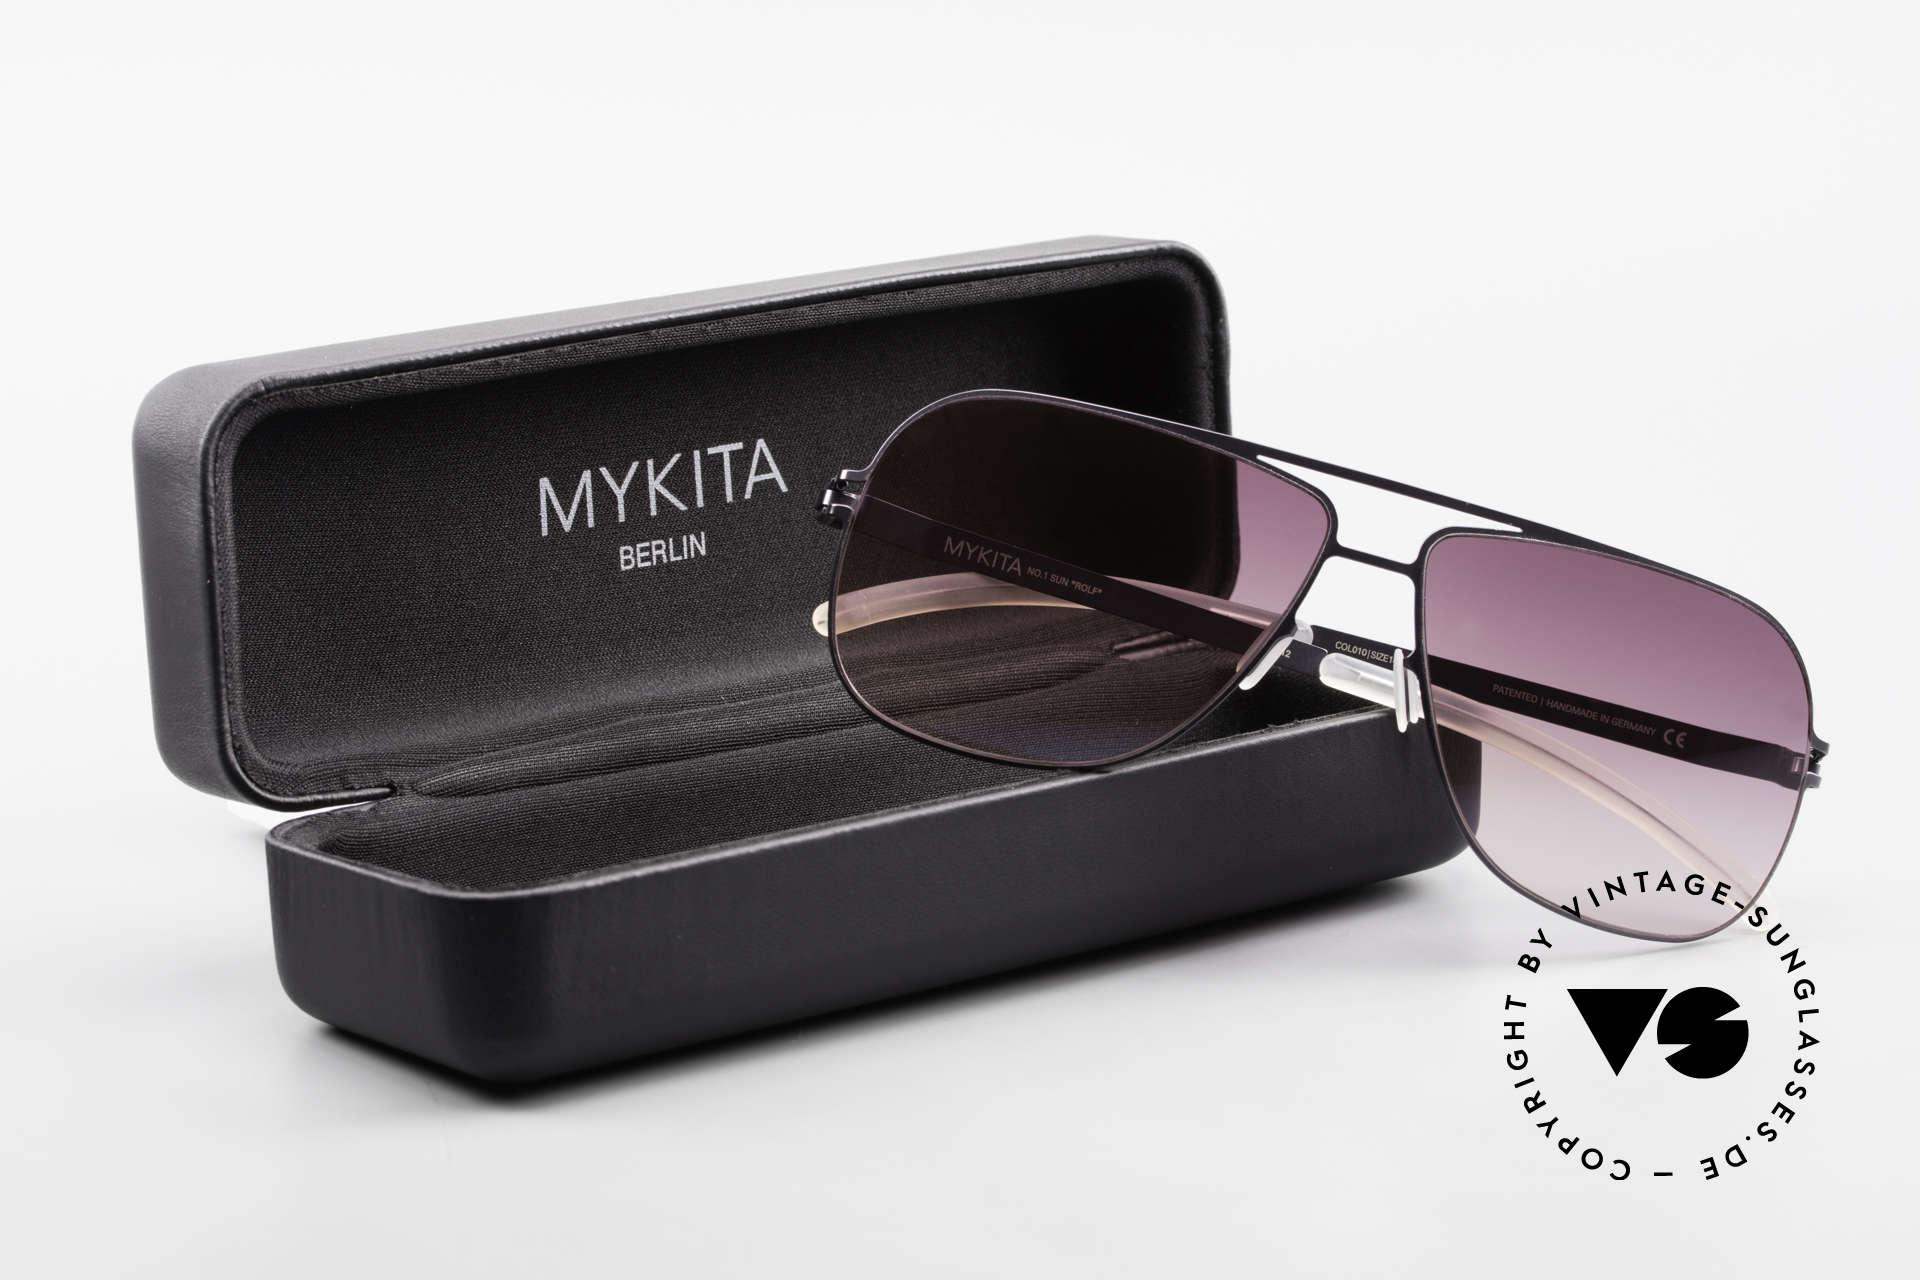 Mykita Rolf Angelina Jolie Mykita Shades, Size: medium, Made for Men and Women